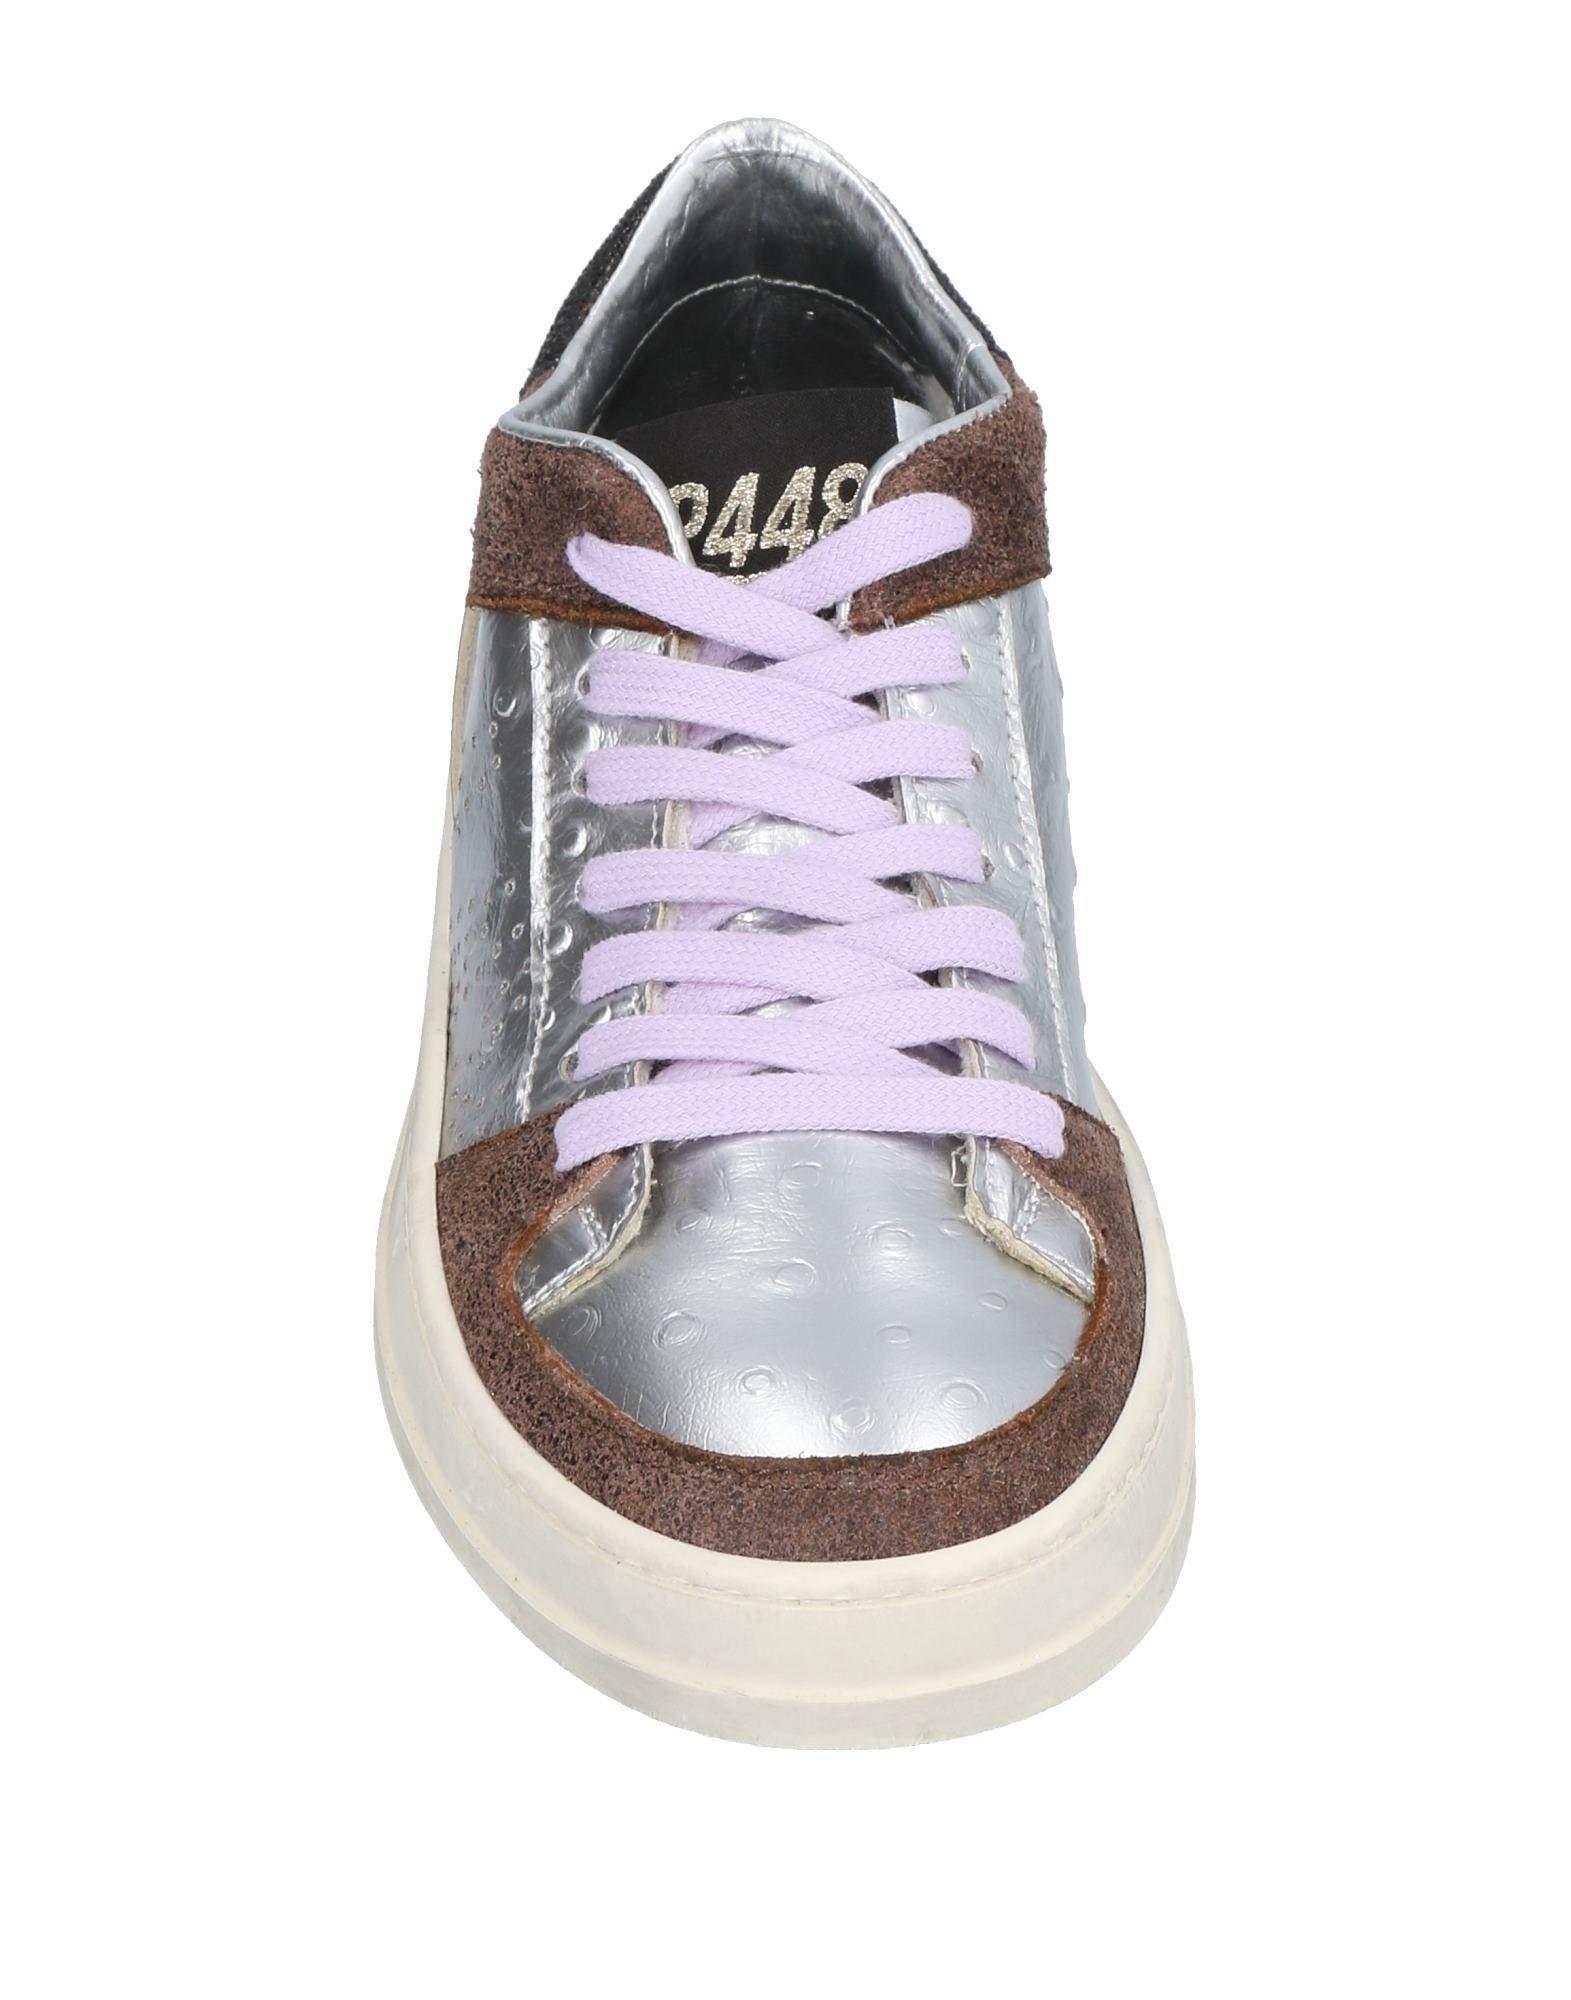 P448 Sneakers Sneakers P448 Damen  11457016KE Gute Qualität beliebte Schuhe a66dfa